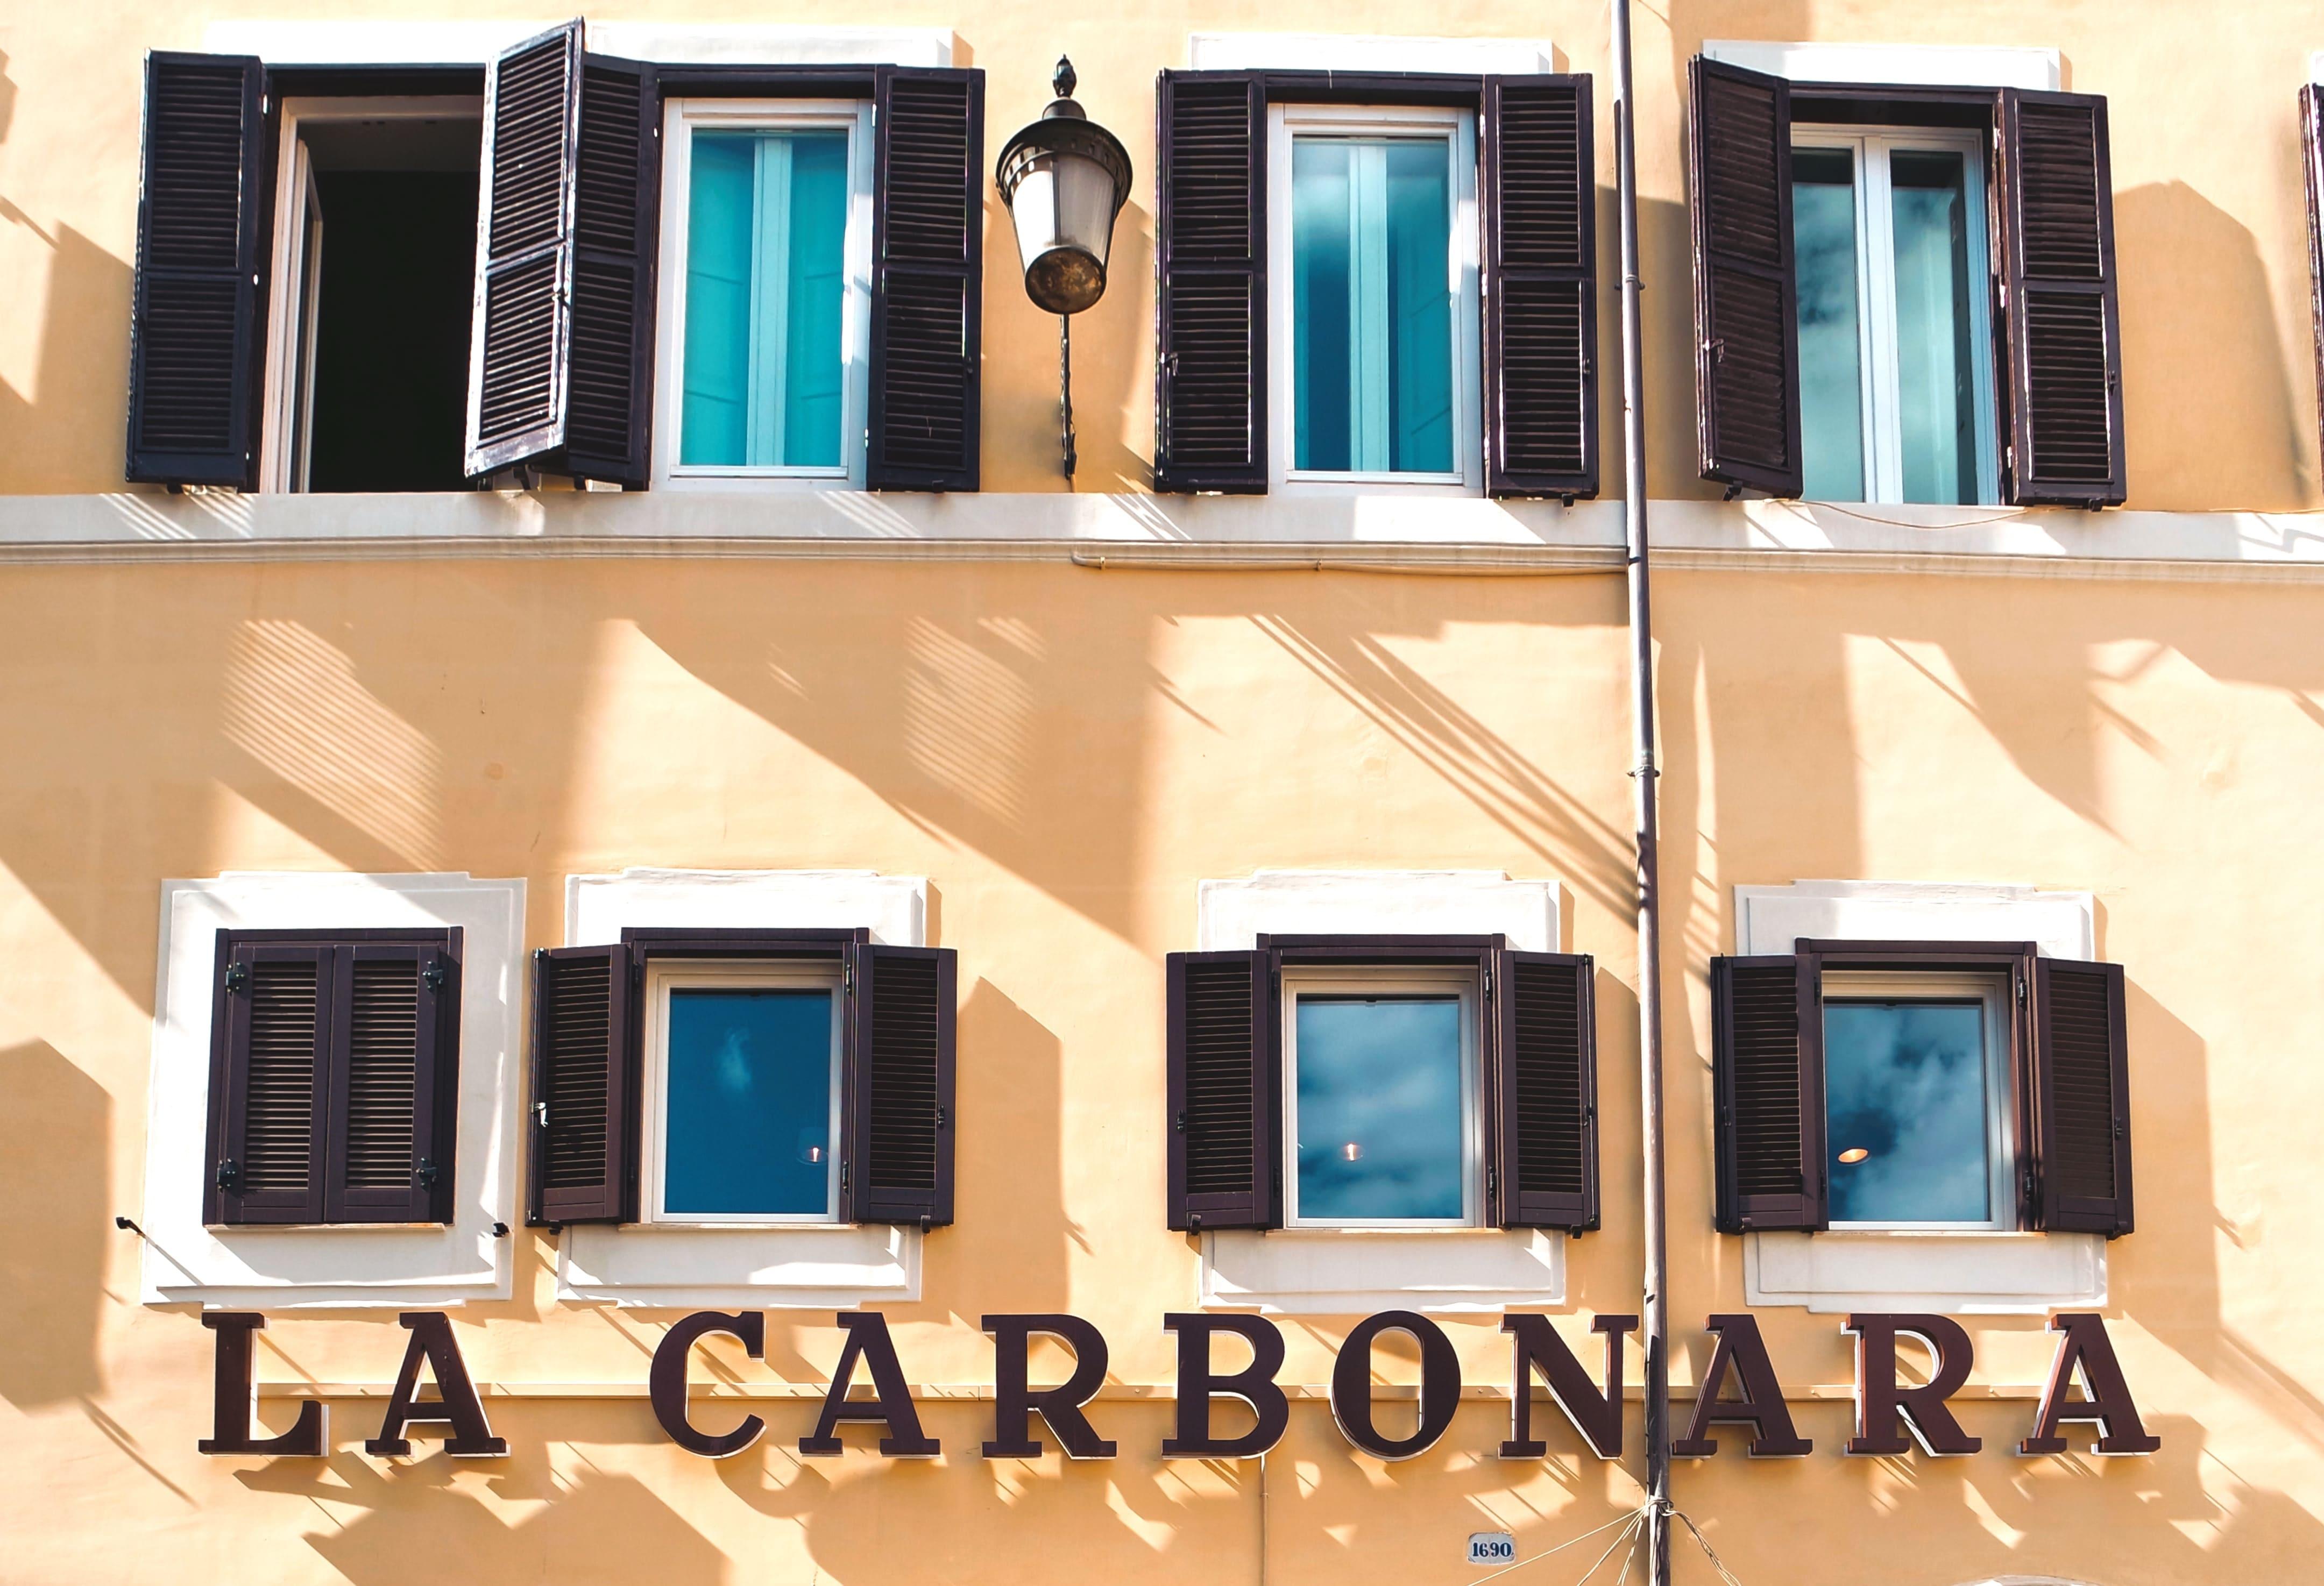 restaurant_traditionnel_trattoria_cuisine_italienne